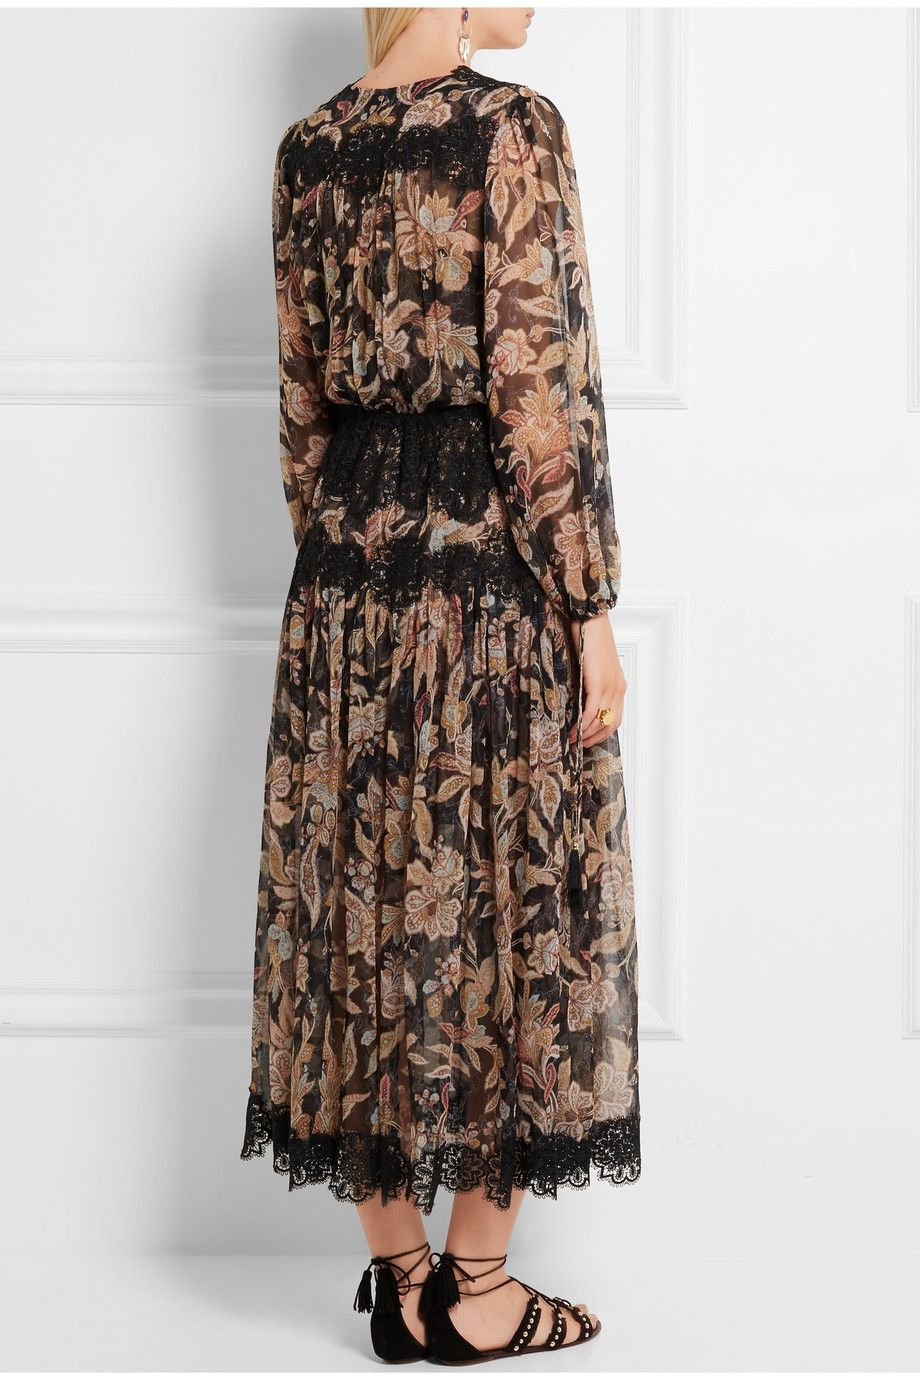 Lace paneled georgette dress